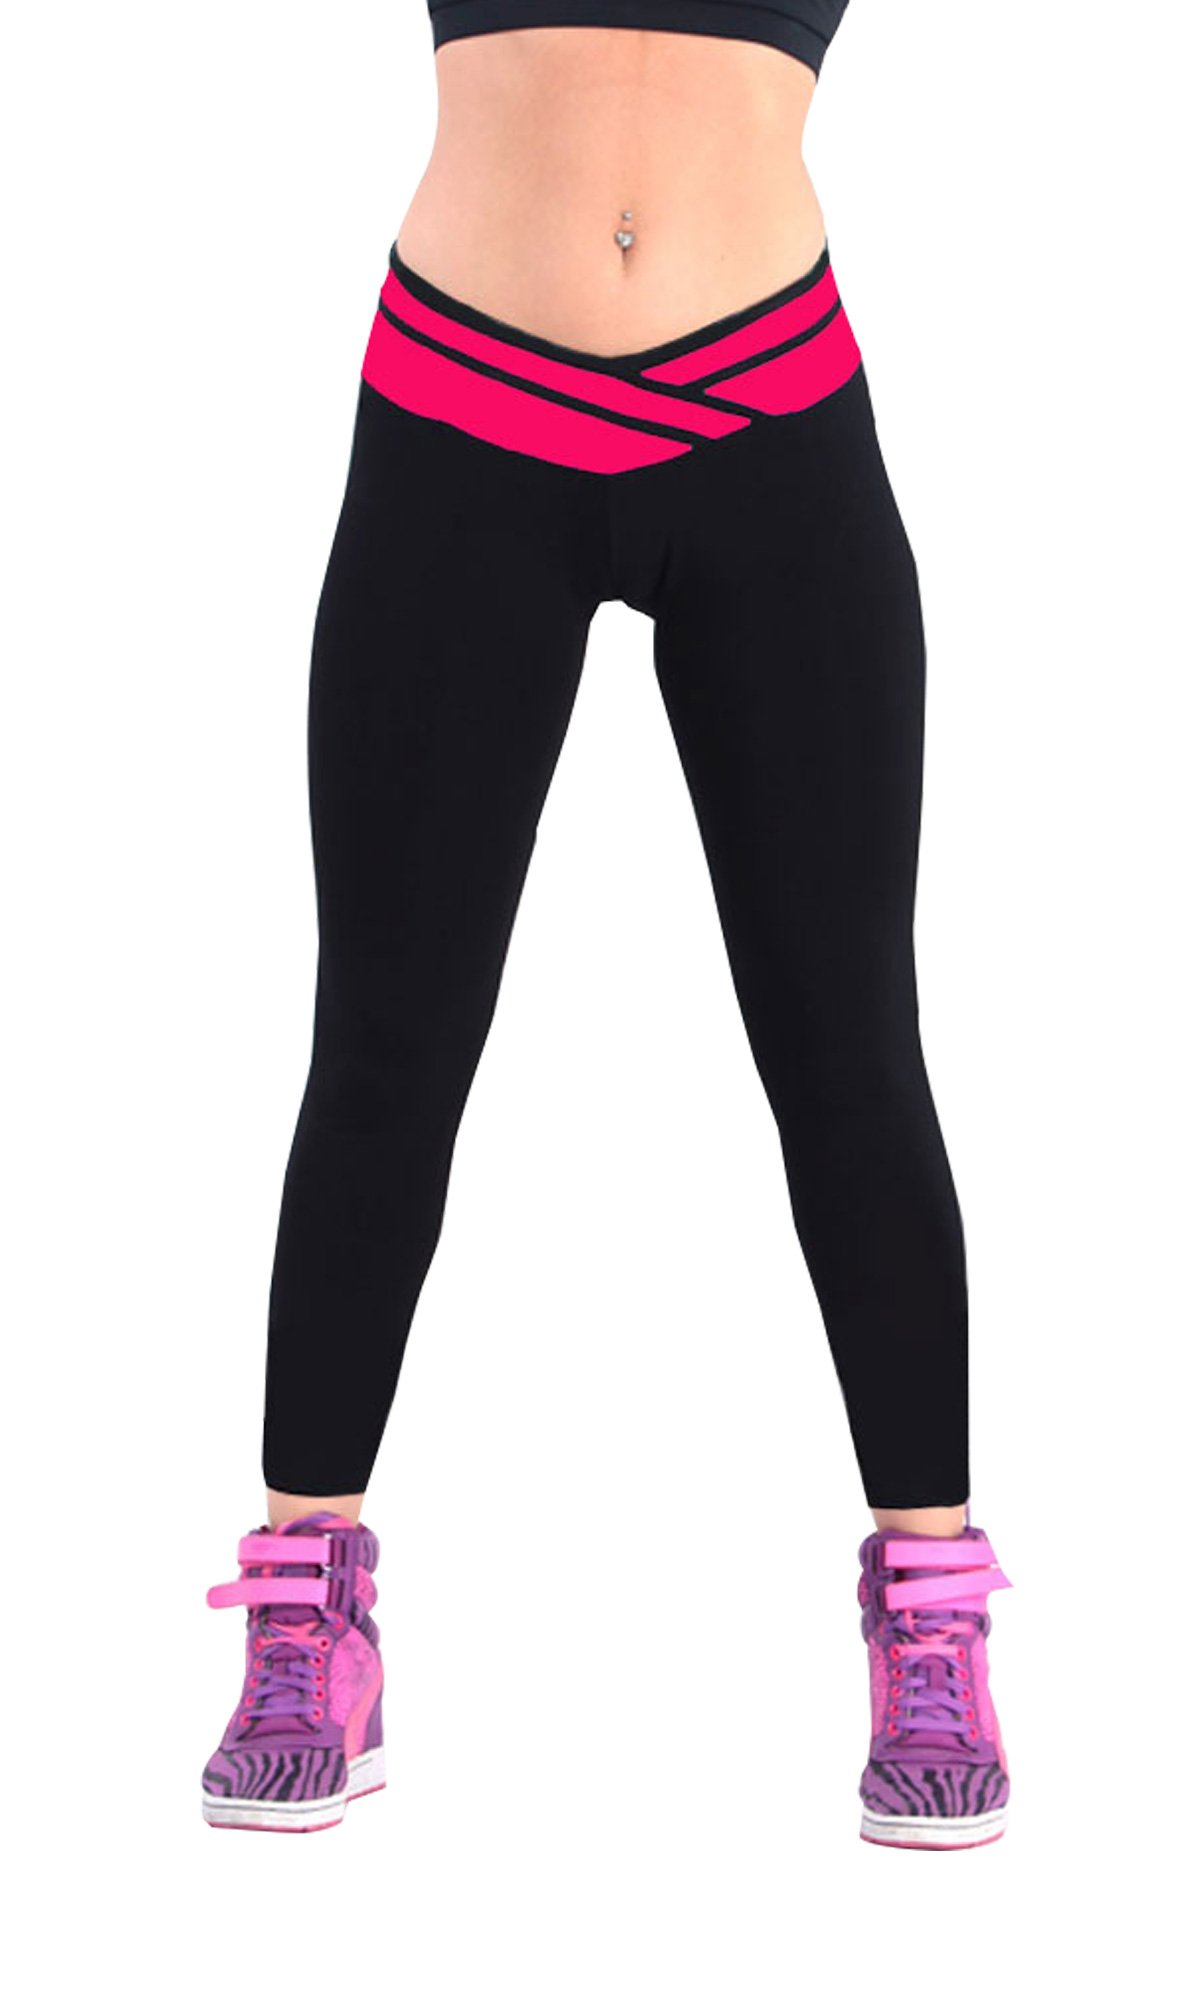 iLoveSIA R Women's Tights Capri Ankle Legging US Size L Black+Rose Red